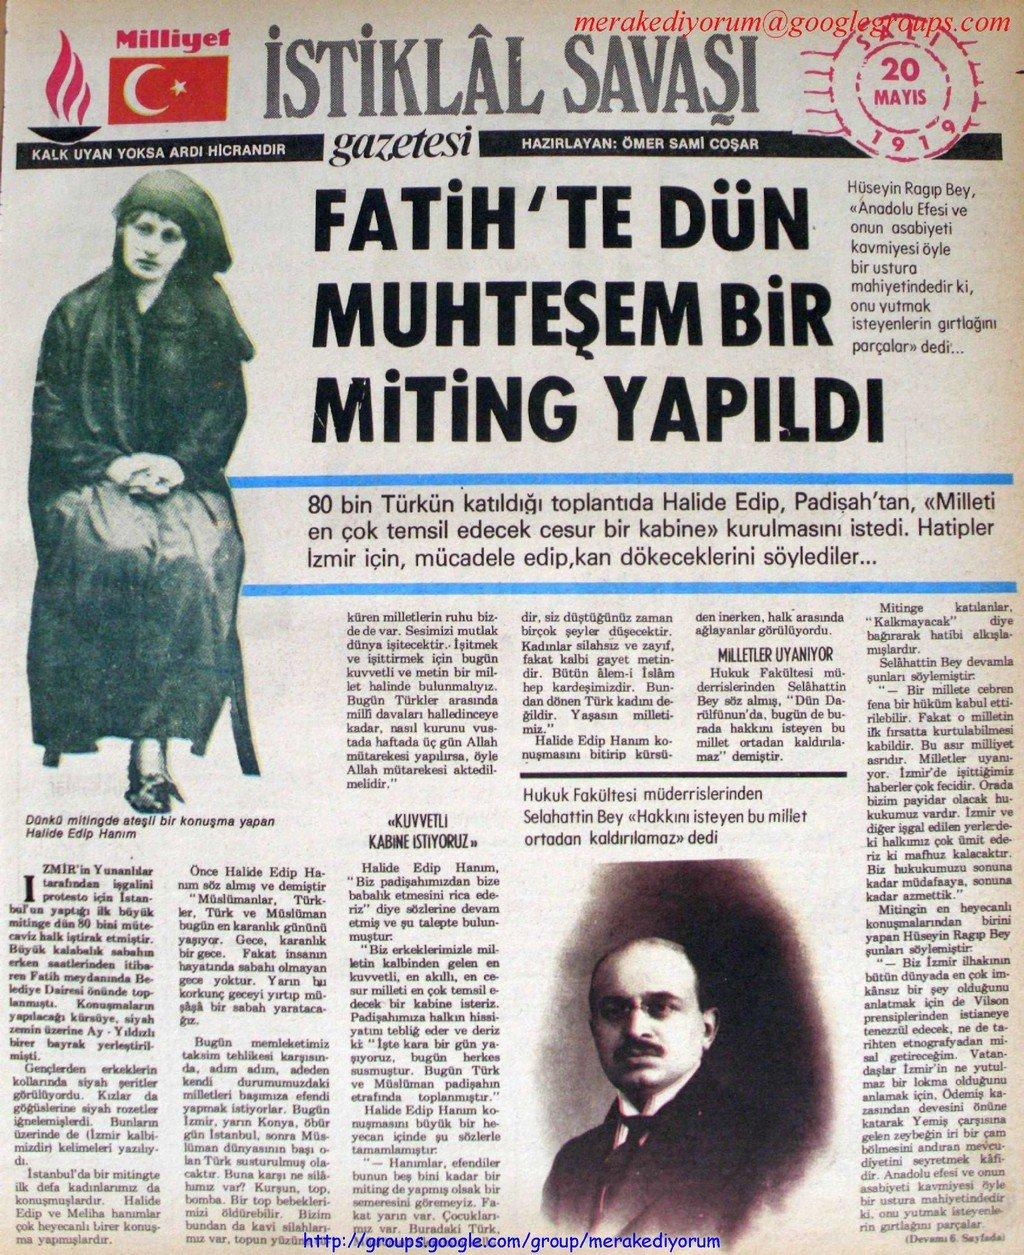 istiklal savaşı gazetesi - 20 mayıs 1919